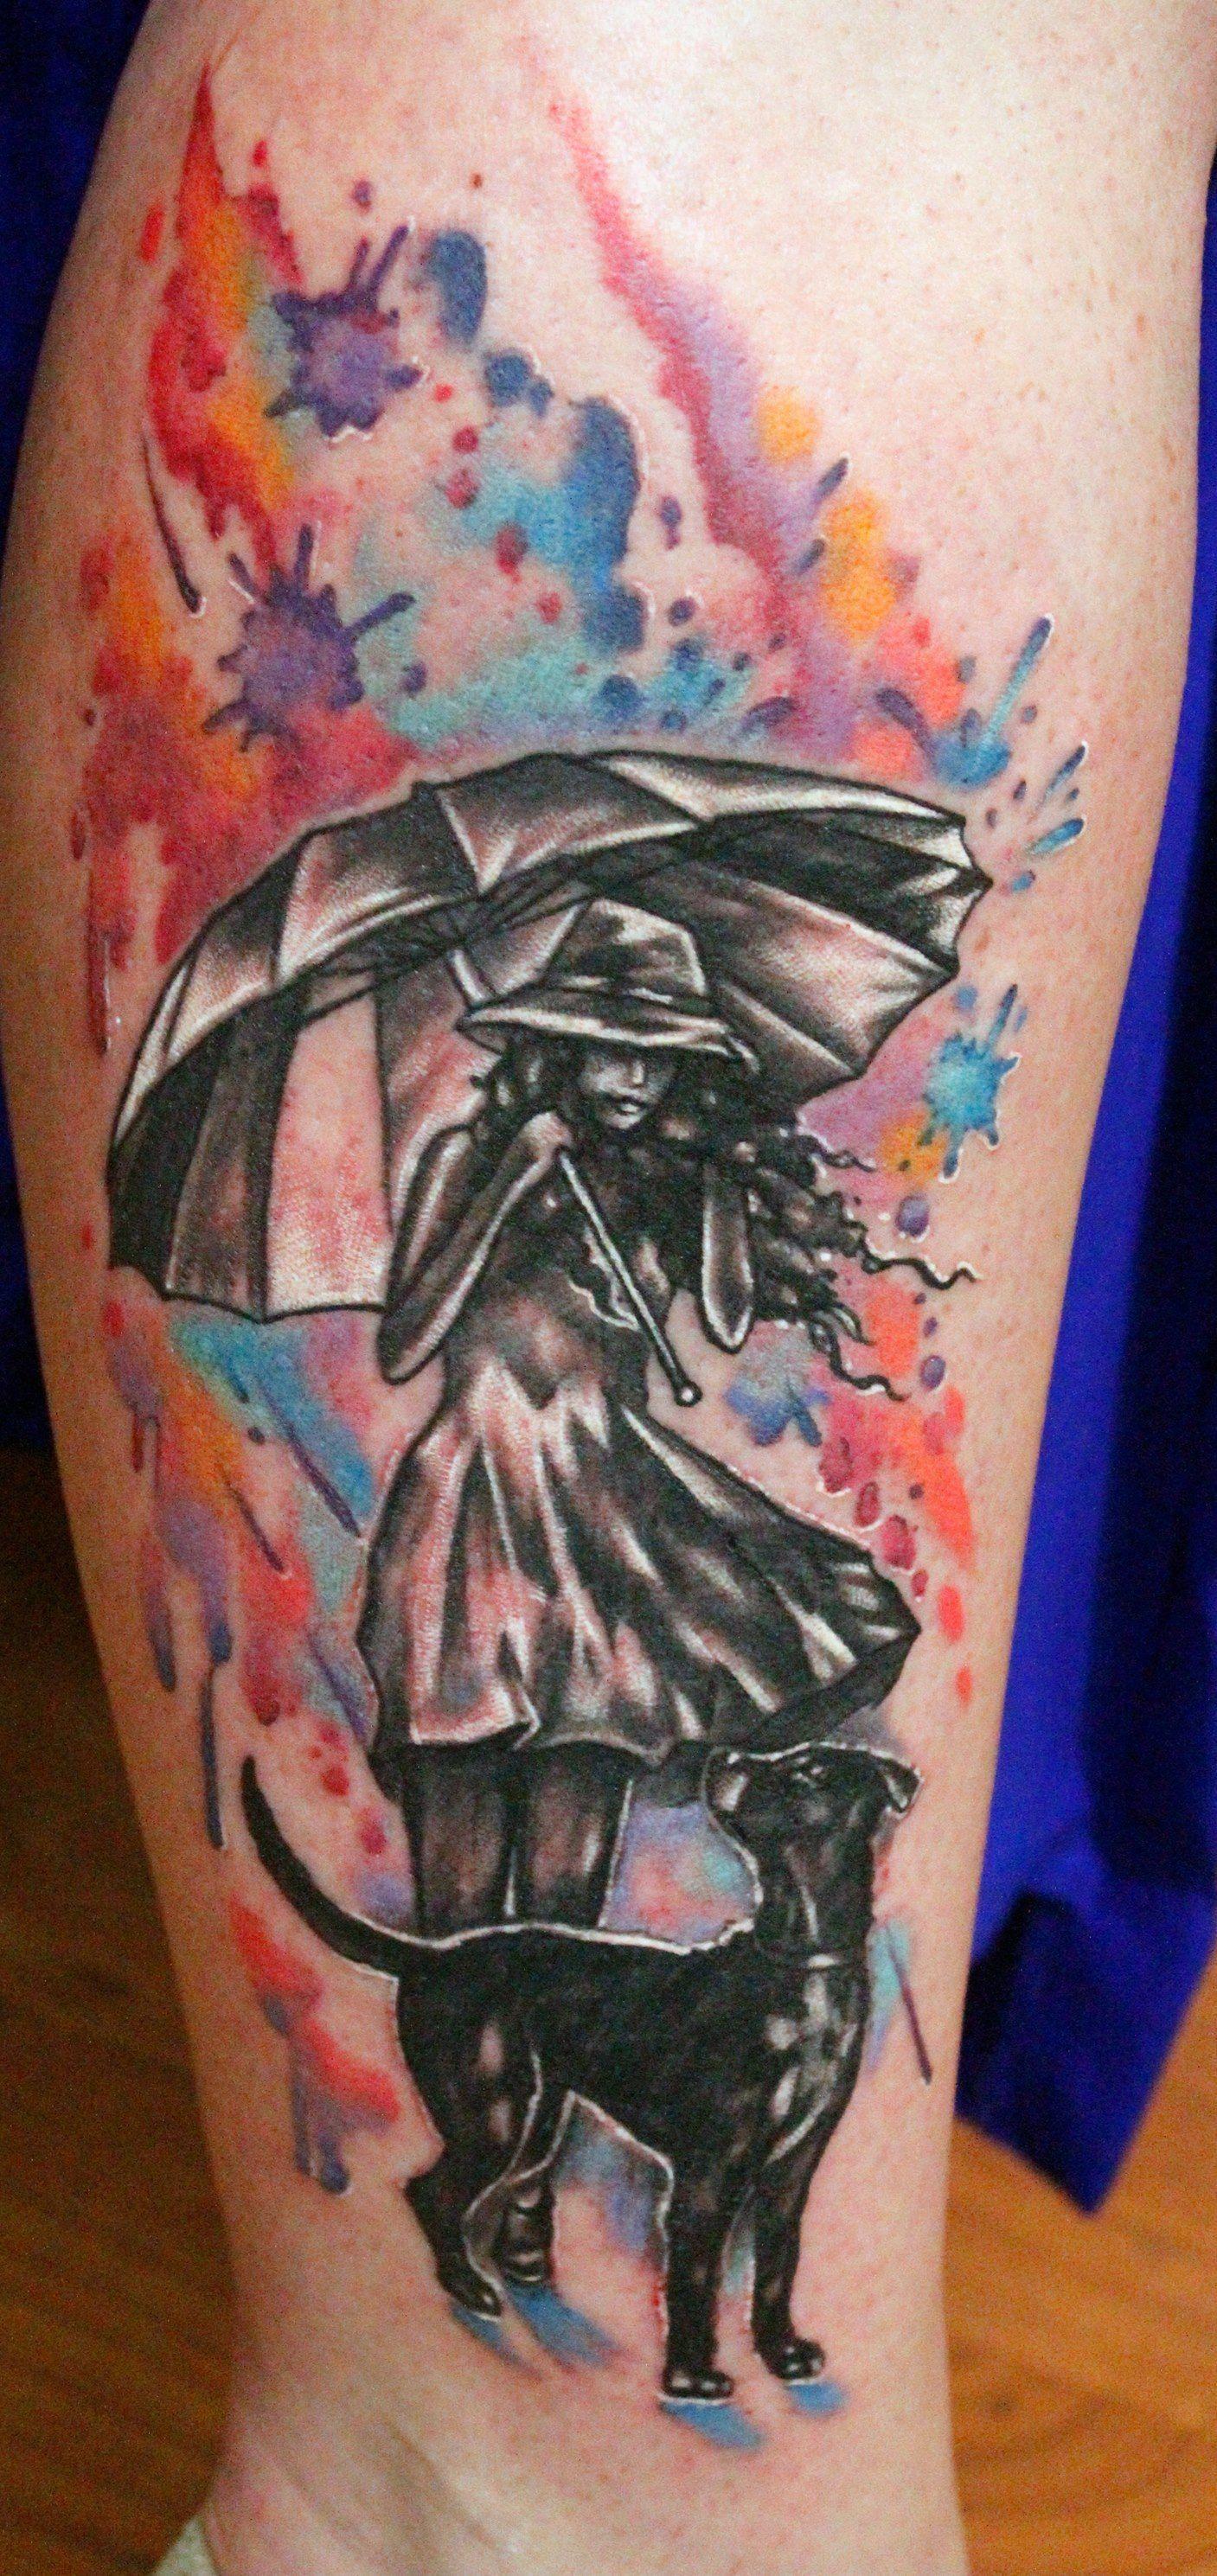 amber rose tattoos on back Tattoosonback Bull tattoos